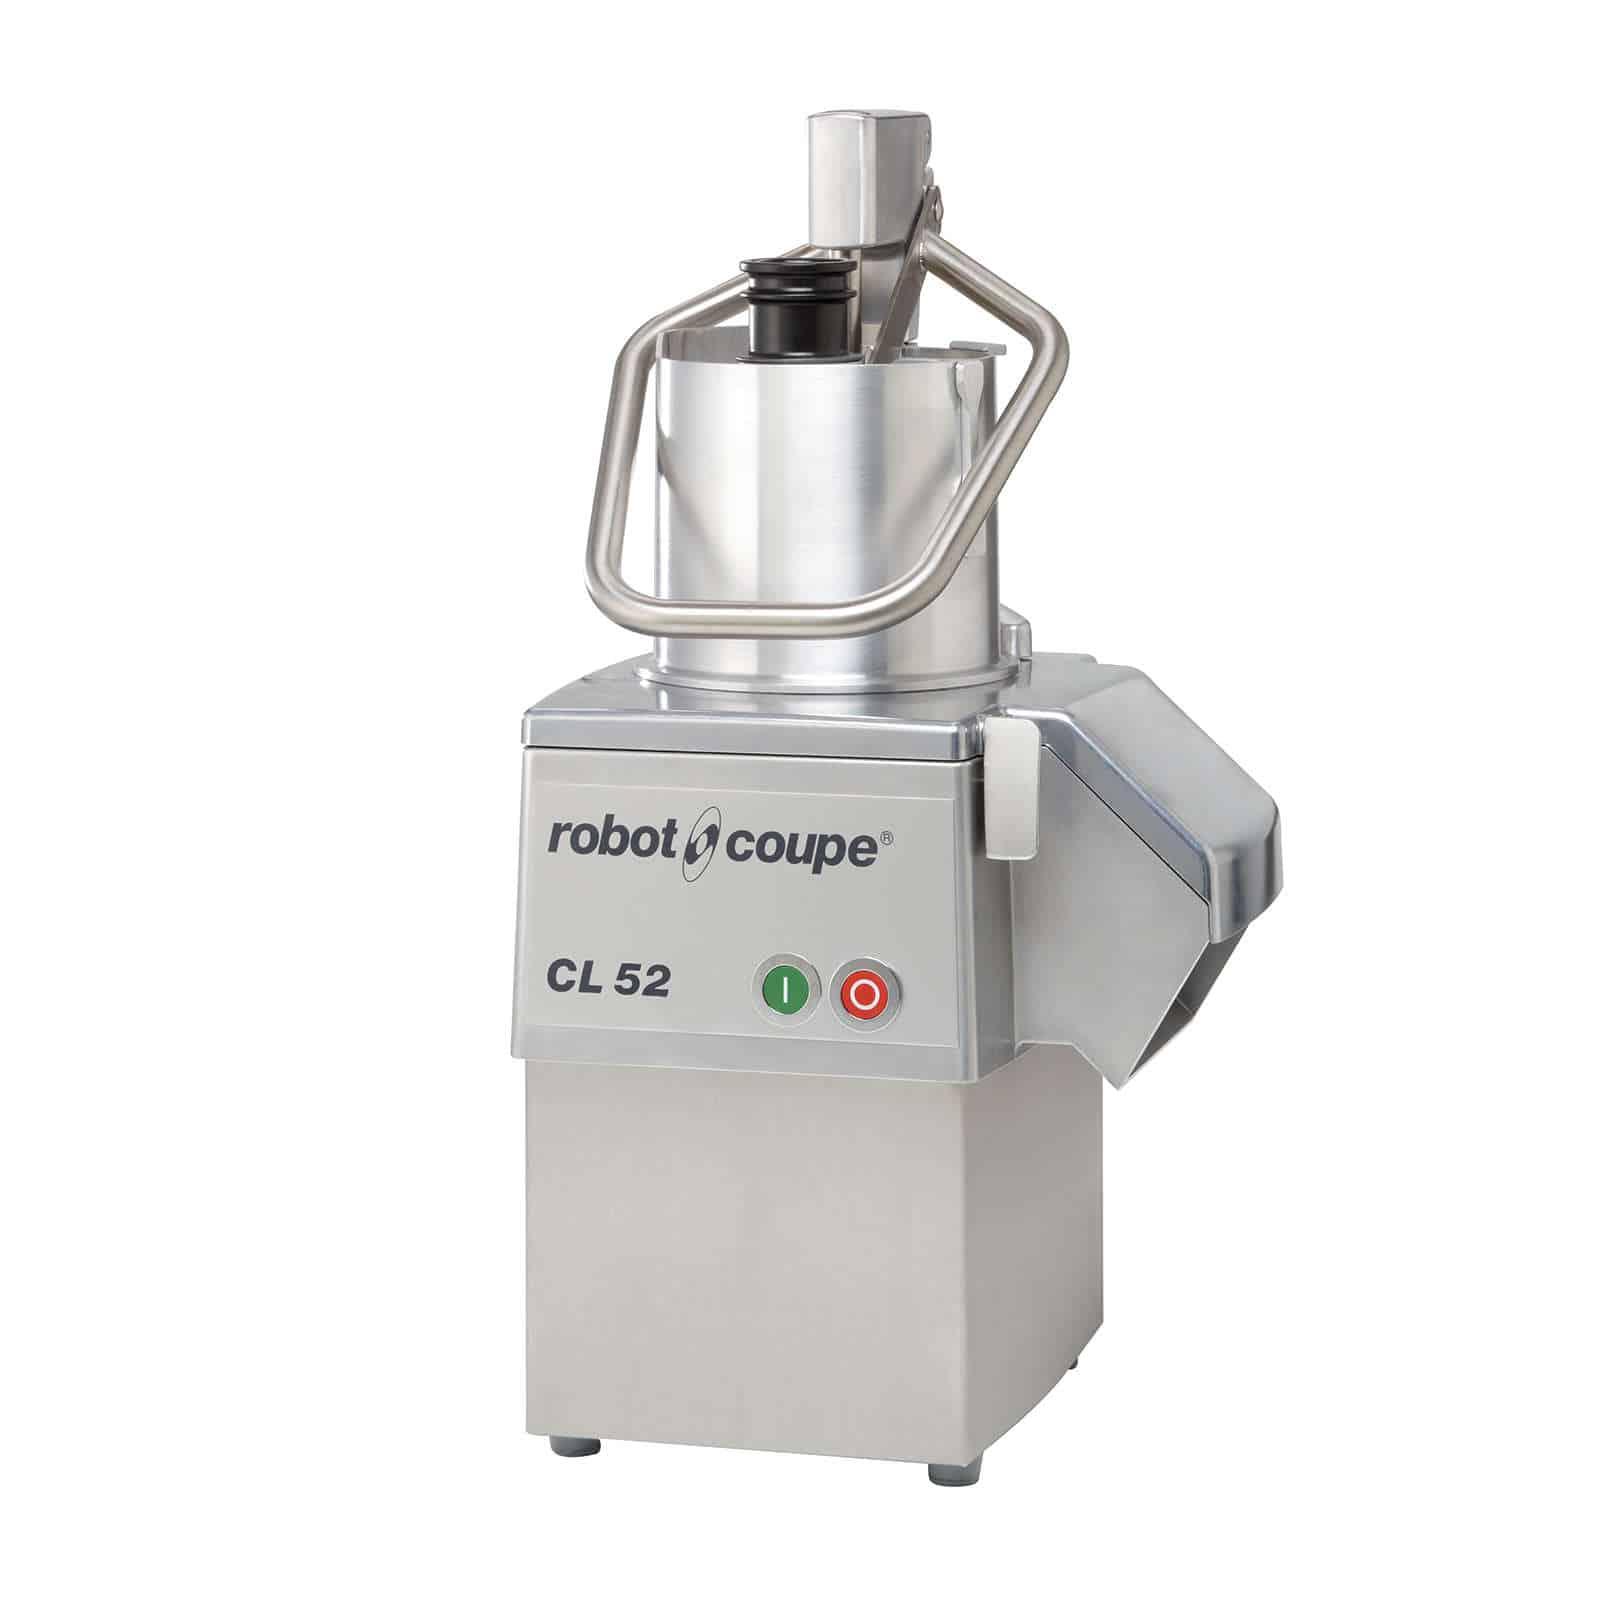 Commercial Food Processor ~ Robot coupe cl e series commercial food processor